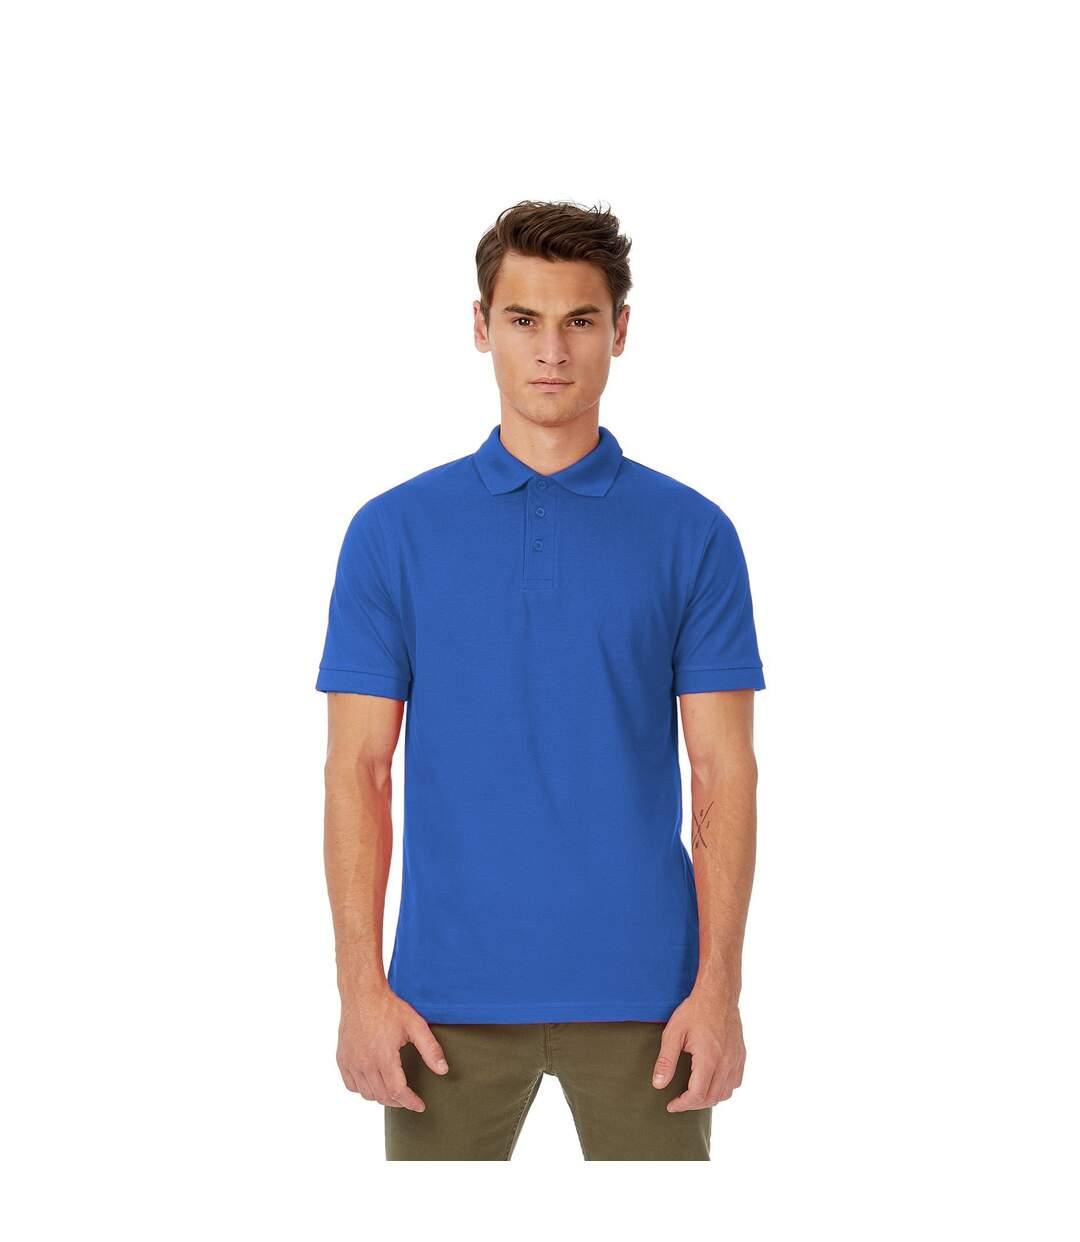 B&C Safran Mens Polo Shirt / Mens Short Sleeve Polo Shirts (Royal) - UTBC103